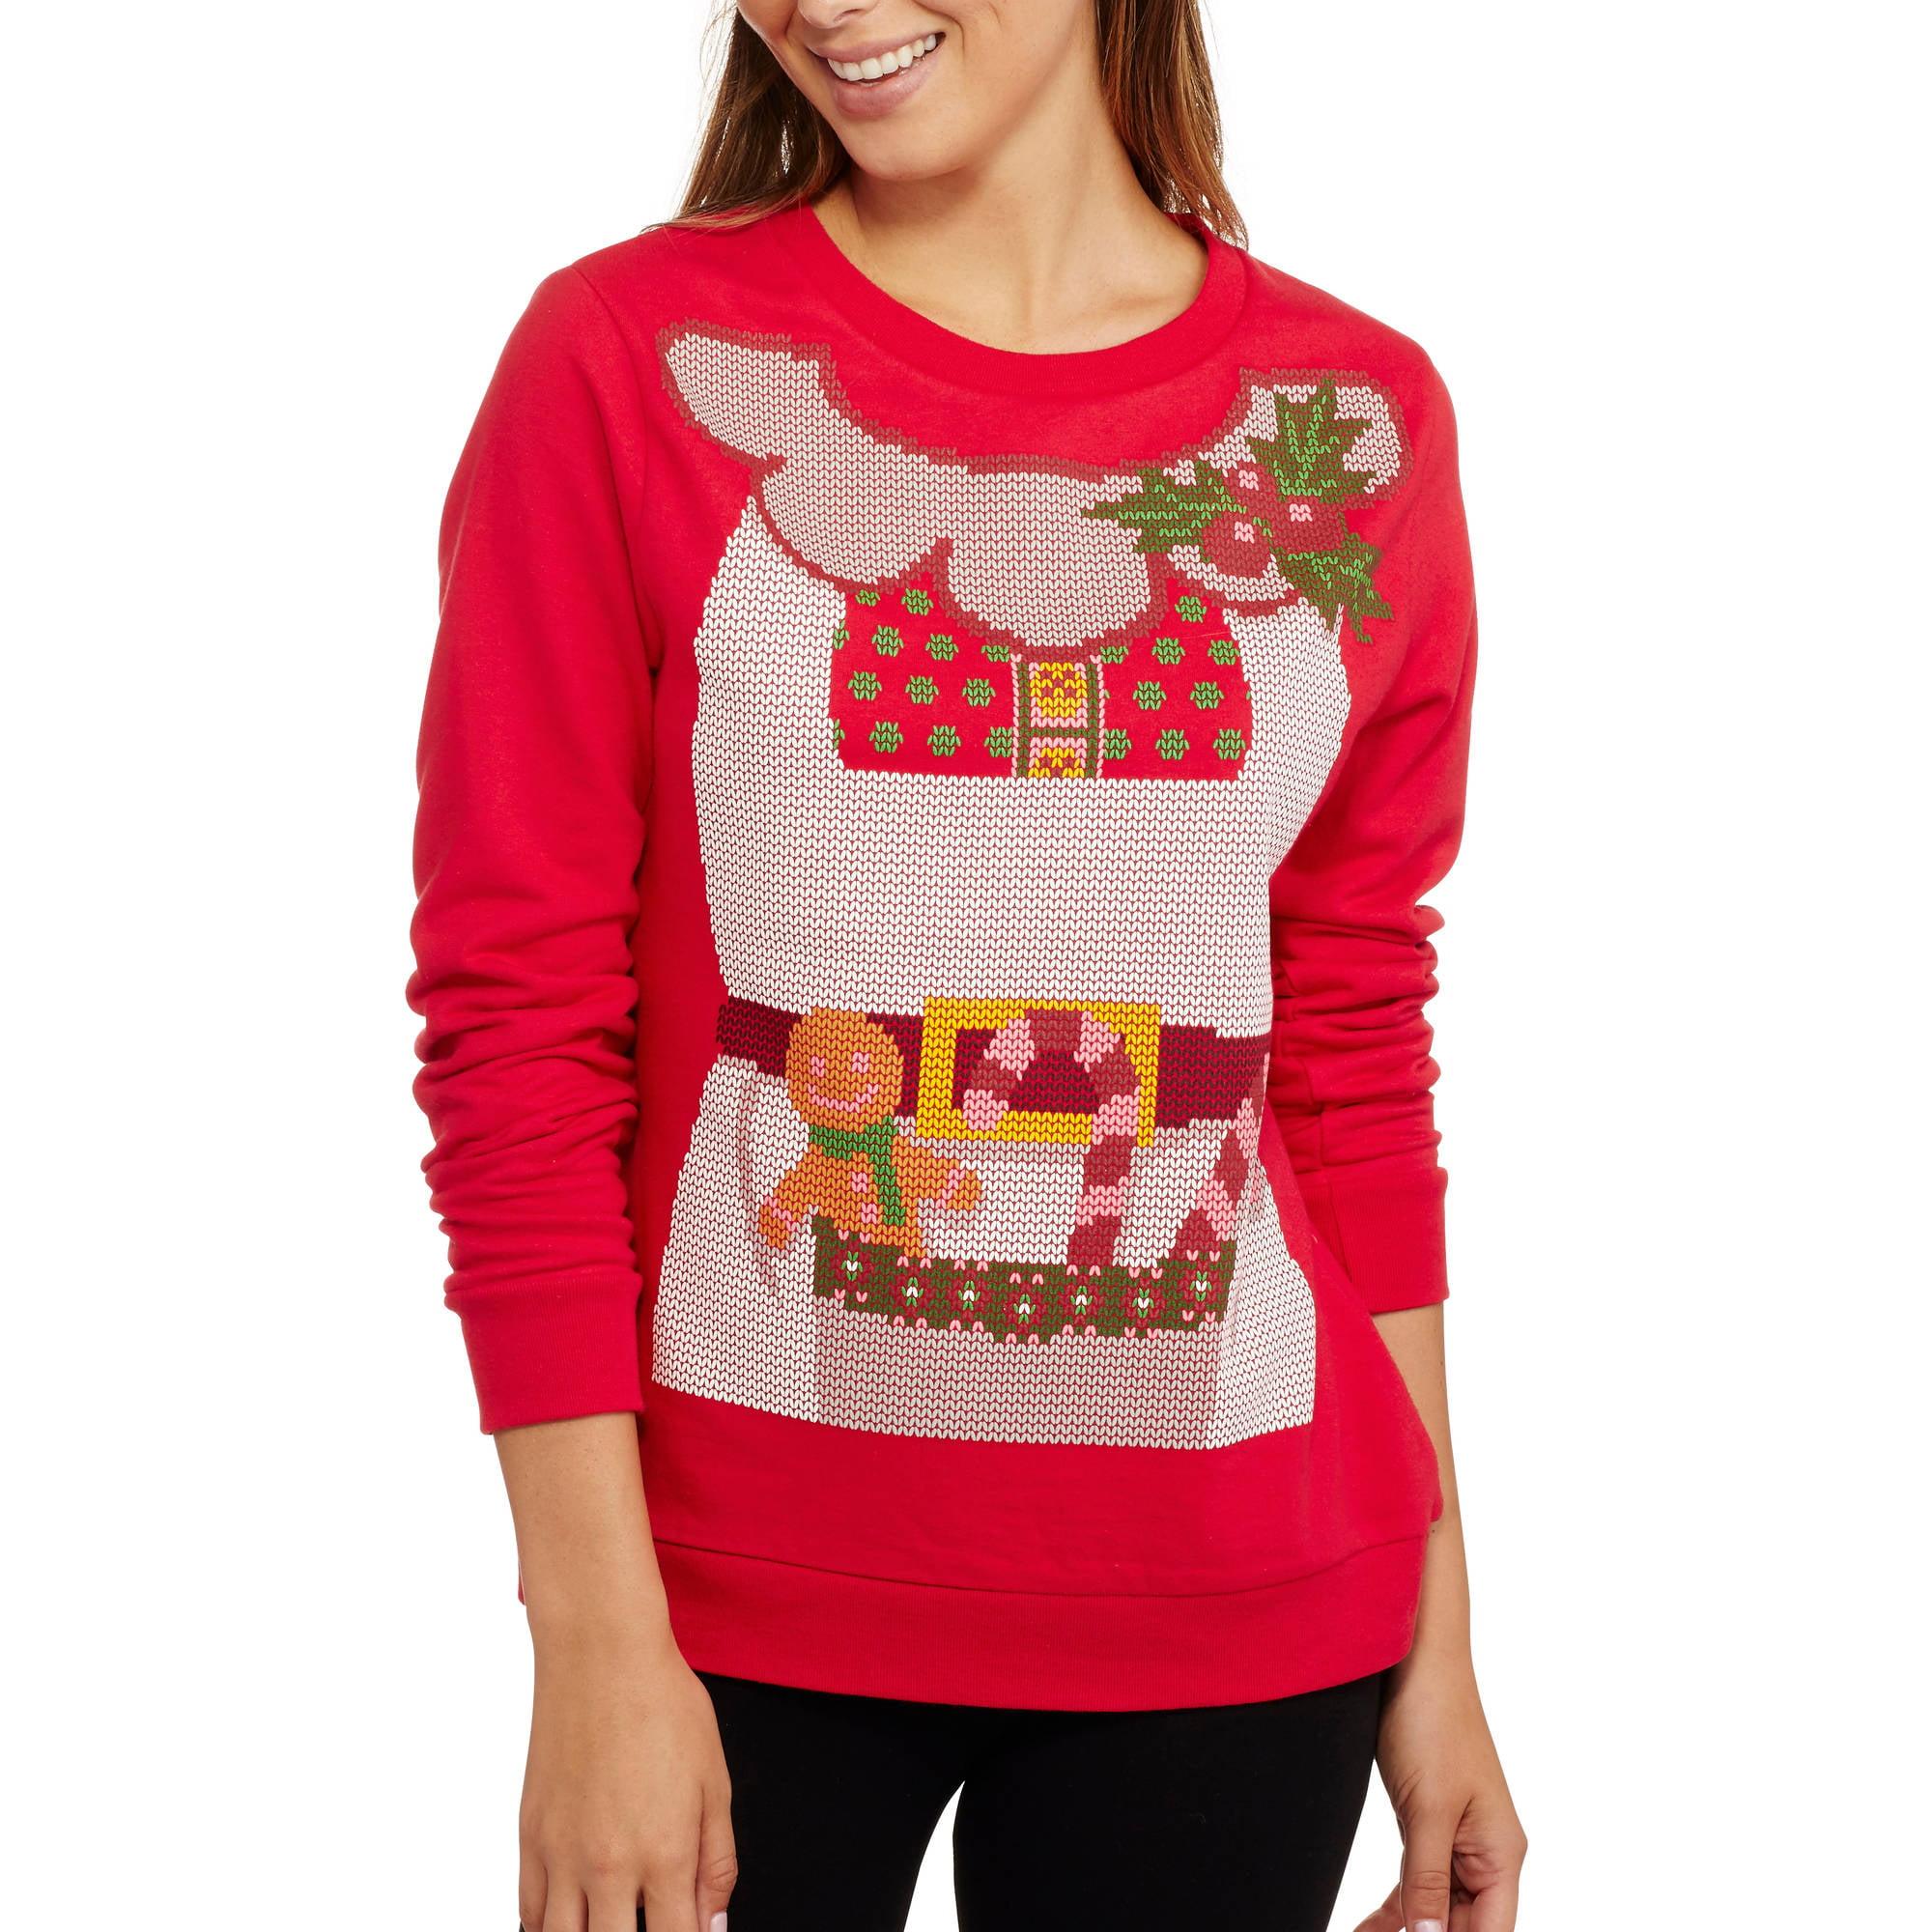 Women's Mrs.Clause Christmas Fleece Crewneck Pullover